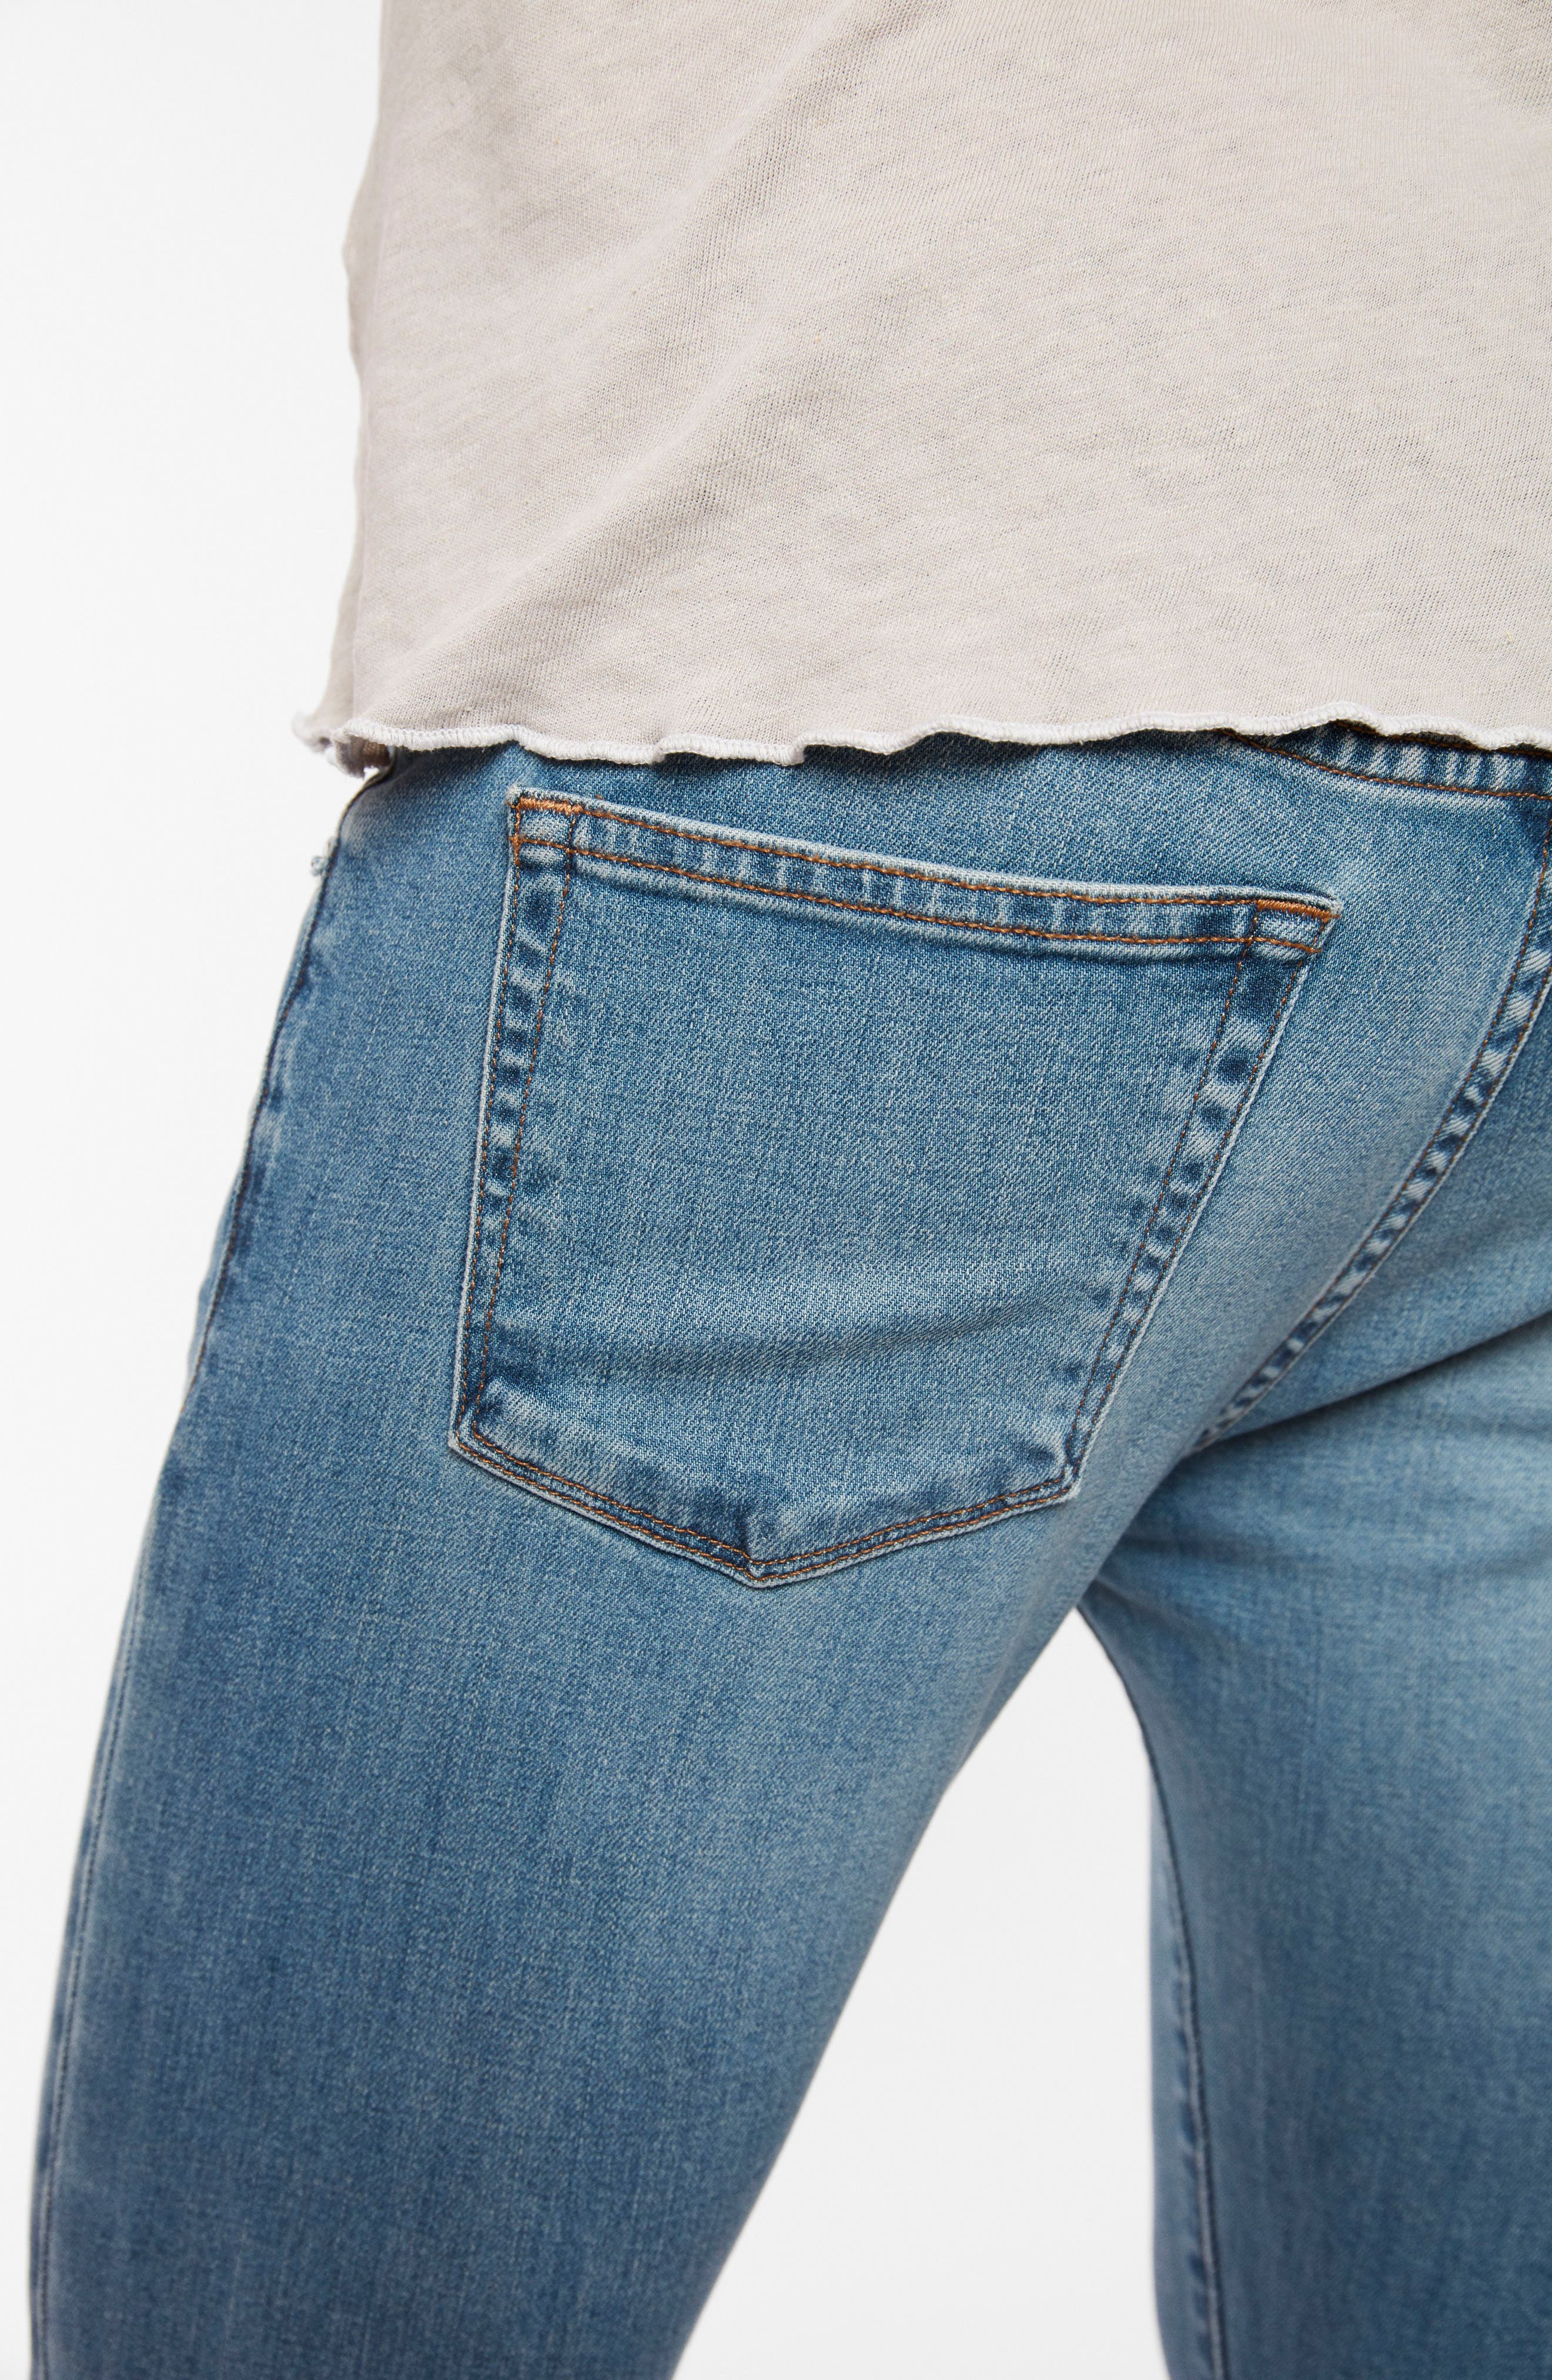 Skinny Fit Jeans,                             Alternate thumbnail 5, color,                             409